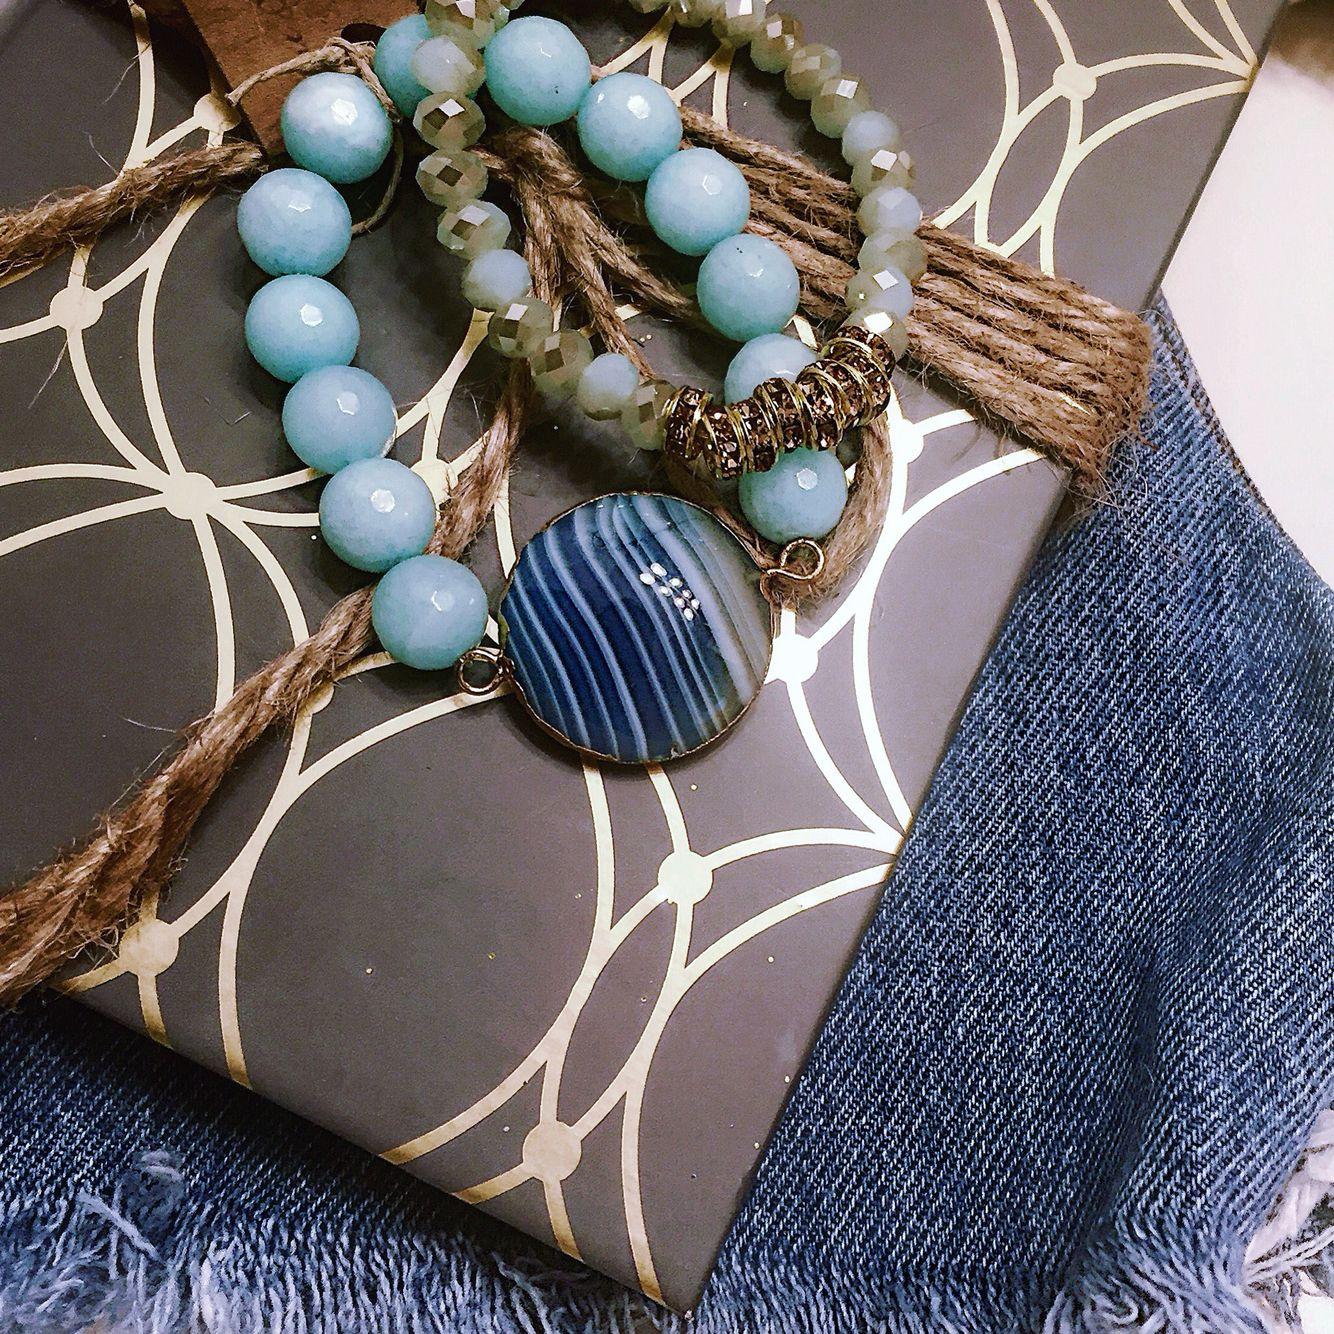 Jeans & Jewels // www.chicsistersdesigns.com